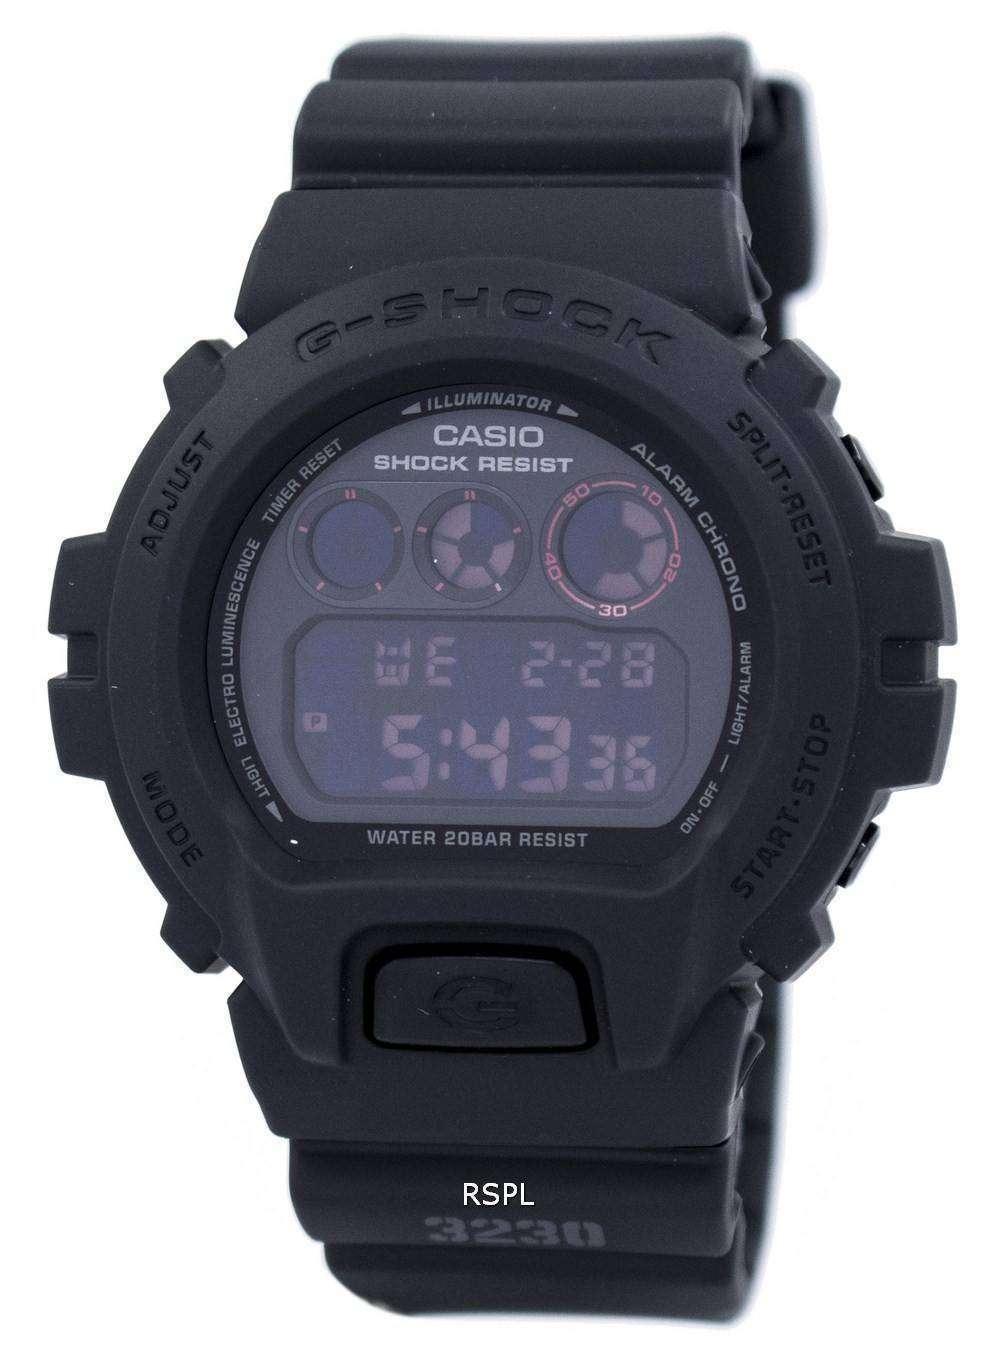 Casio G-shock Dw-6900ms-1d Dw6900ms-1d Men U0026 39 S Watch